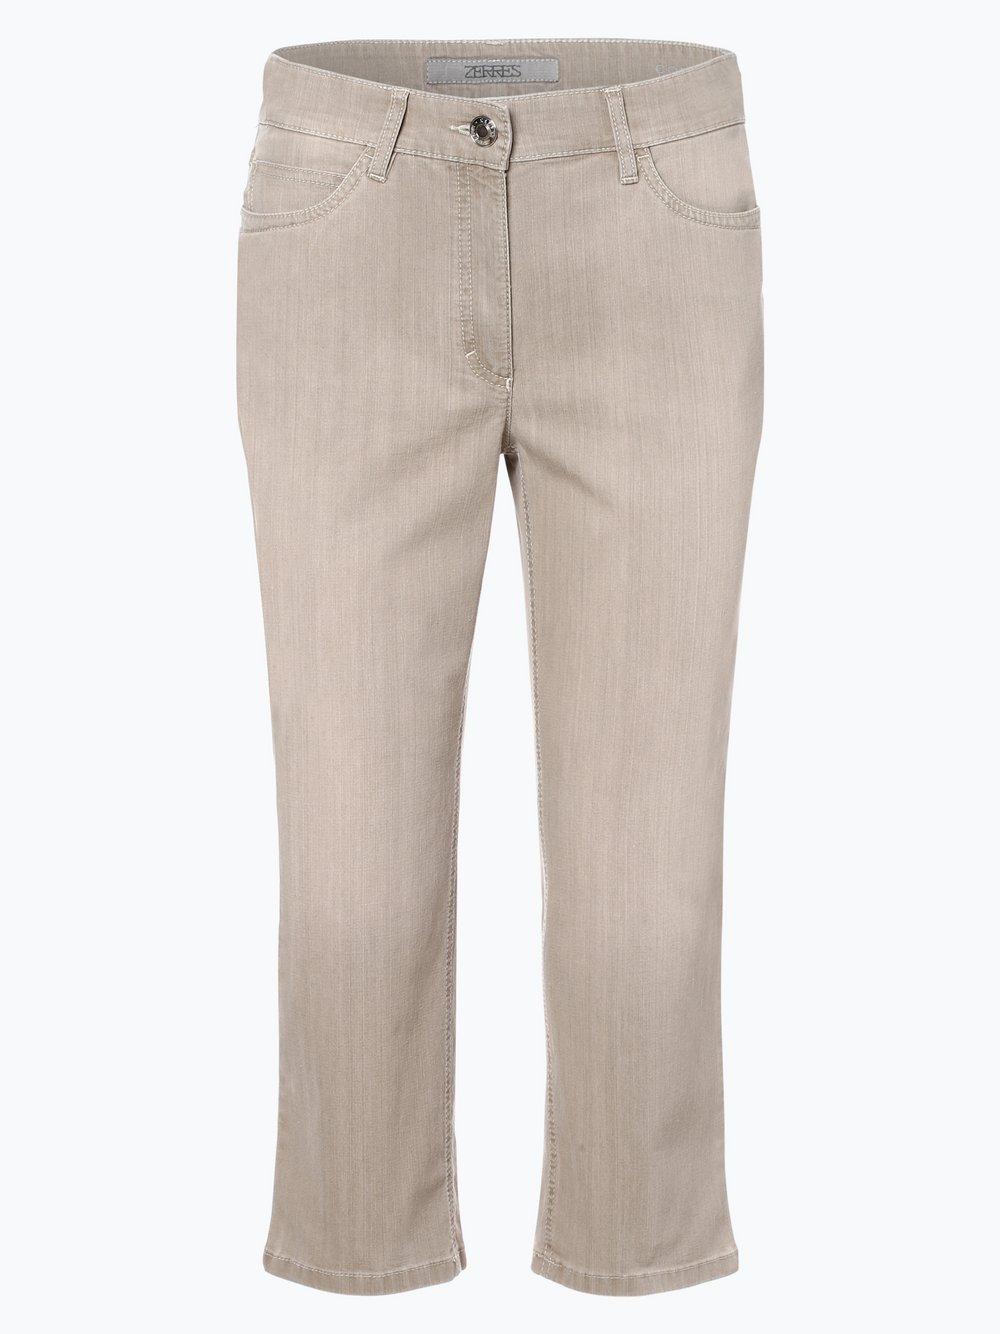 Zerres – Spodnie damskie, zielony Van Graaf 435813-0003-00400